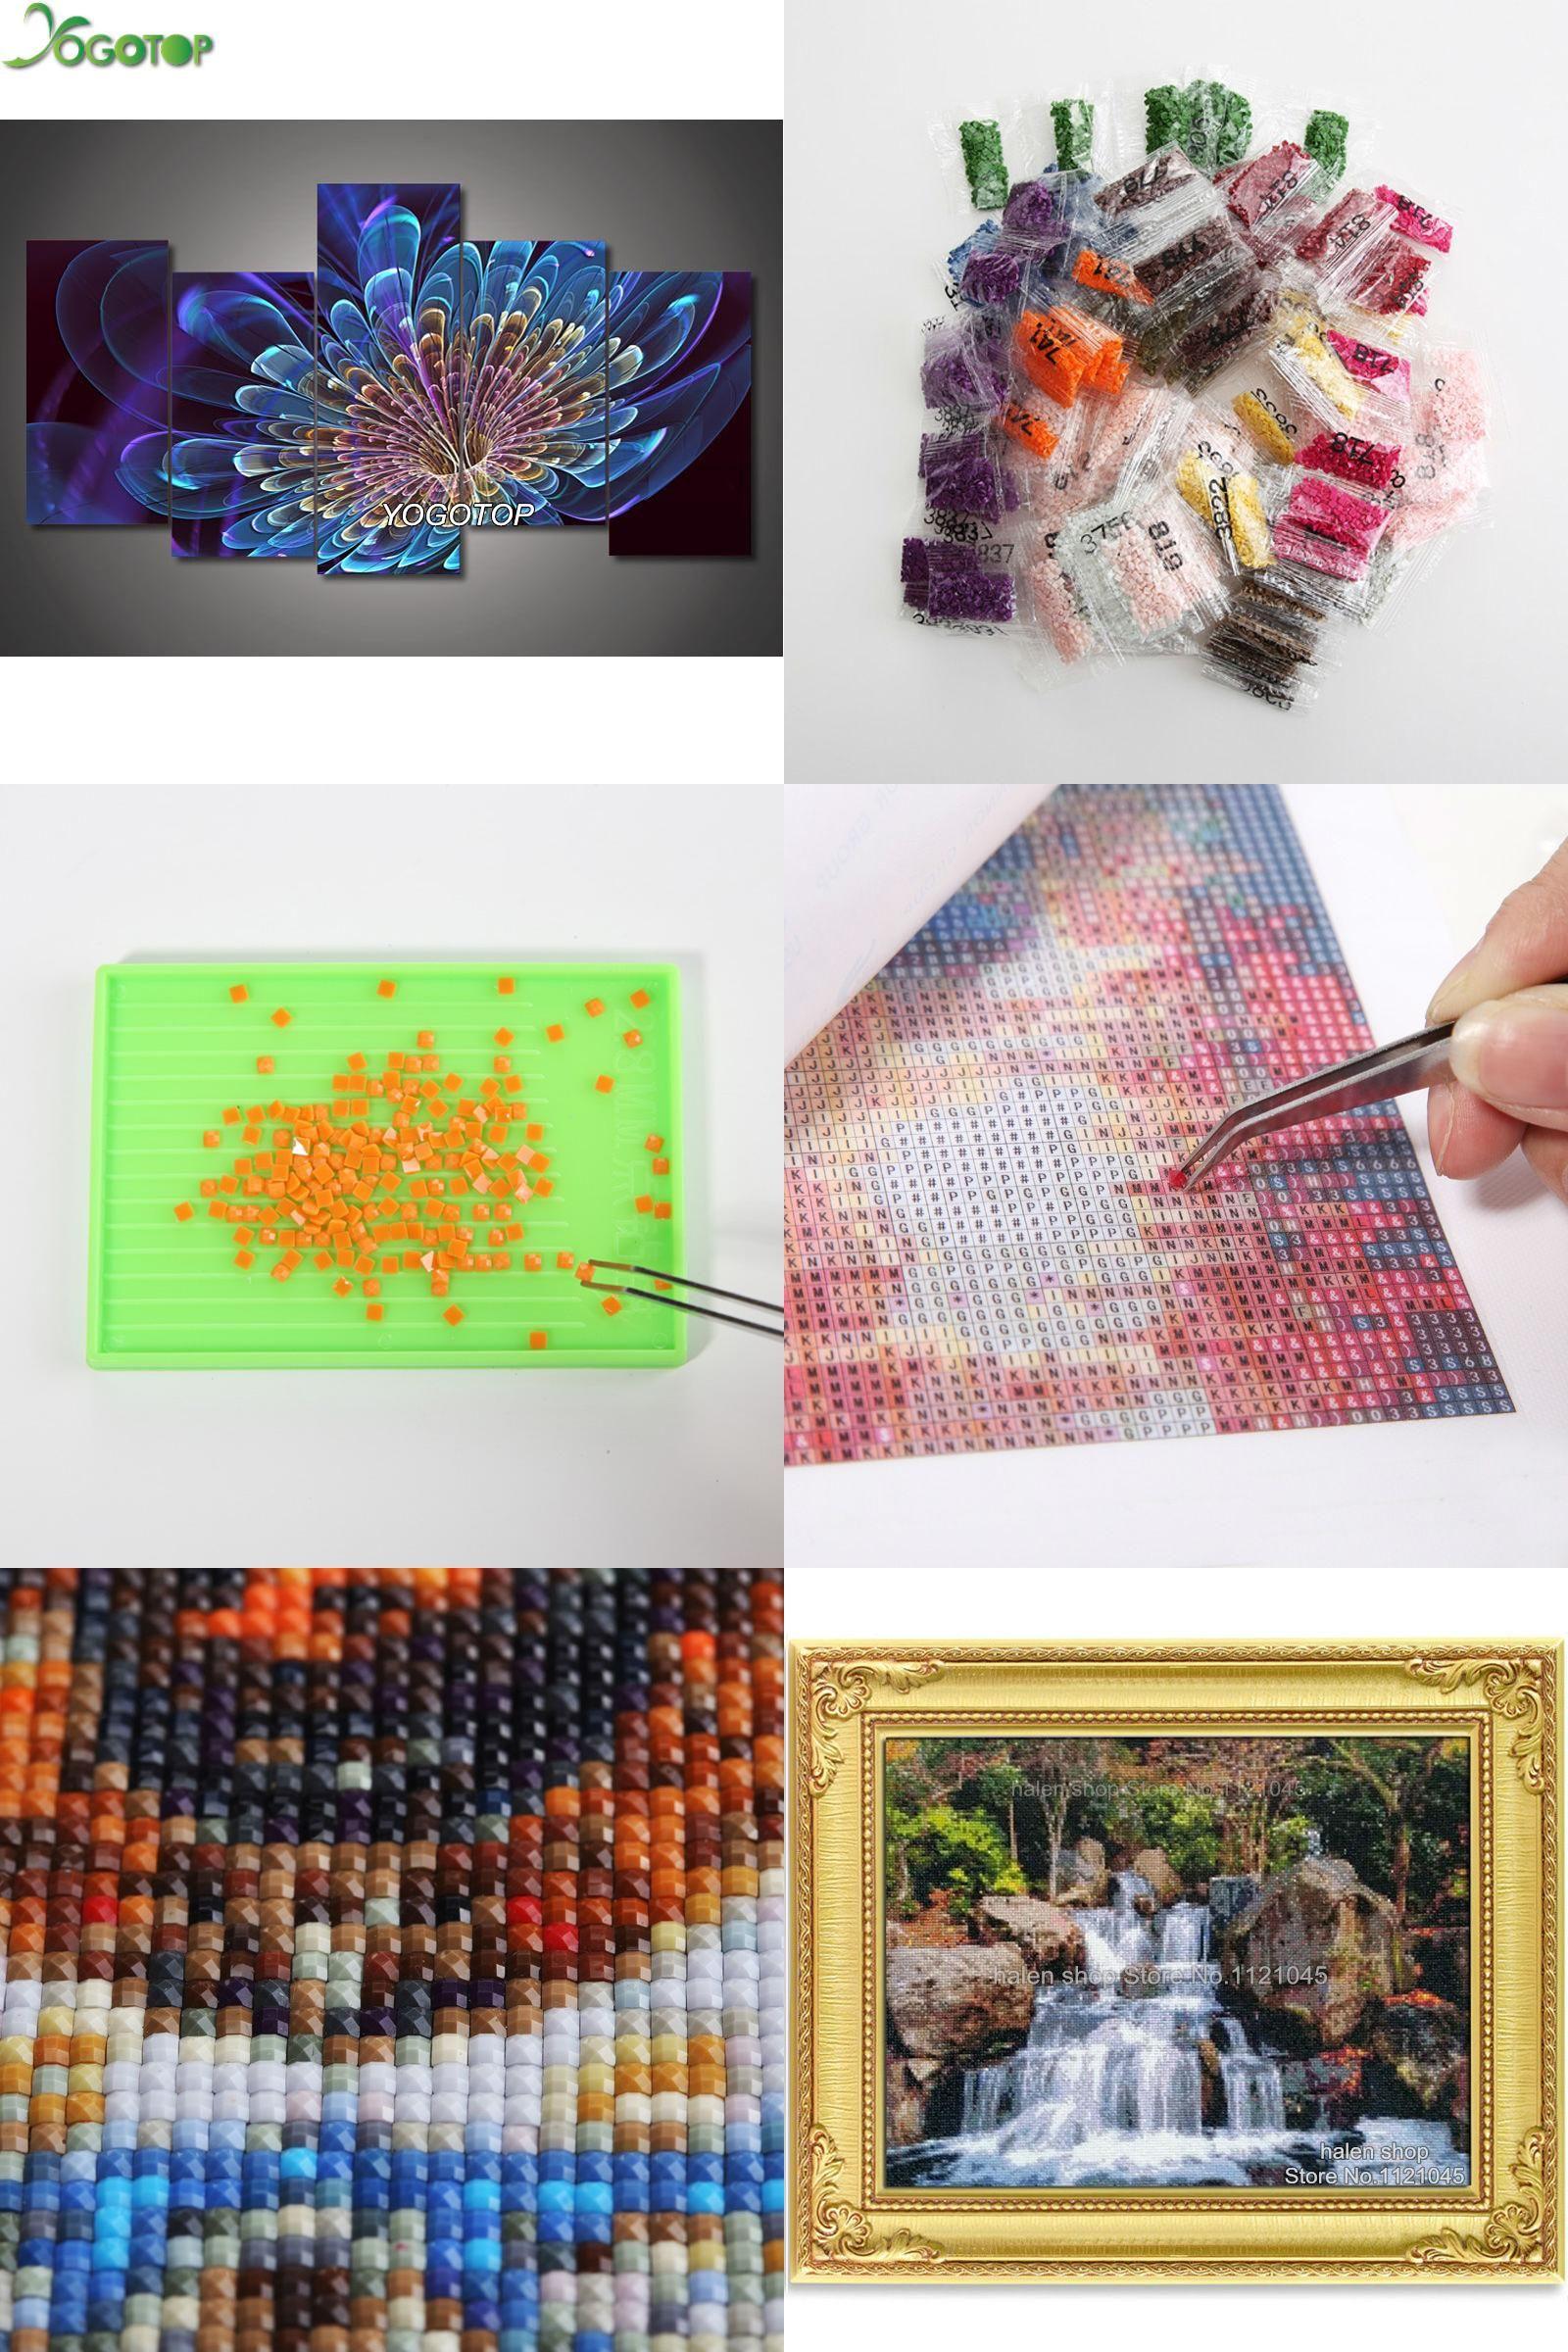 aafe7d3300 [Visit to Buy] YOGOTOP DIY 5D Diamond Painting Cross Stitch Full Diamond  Embroidery 5D